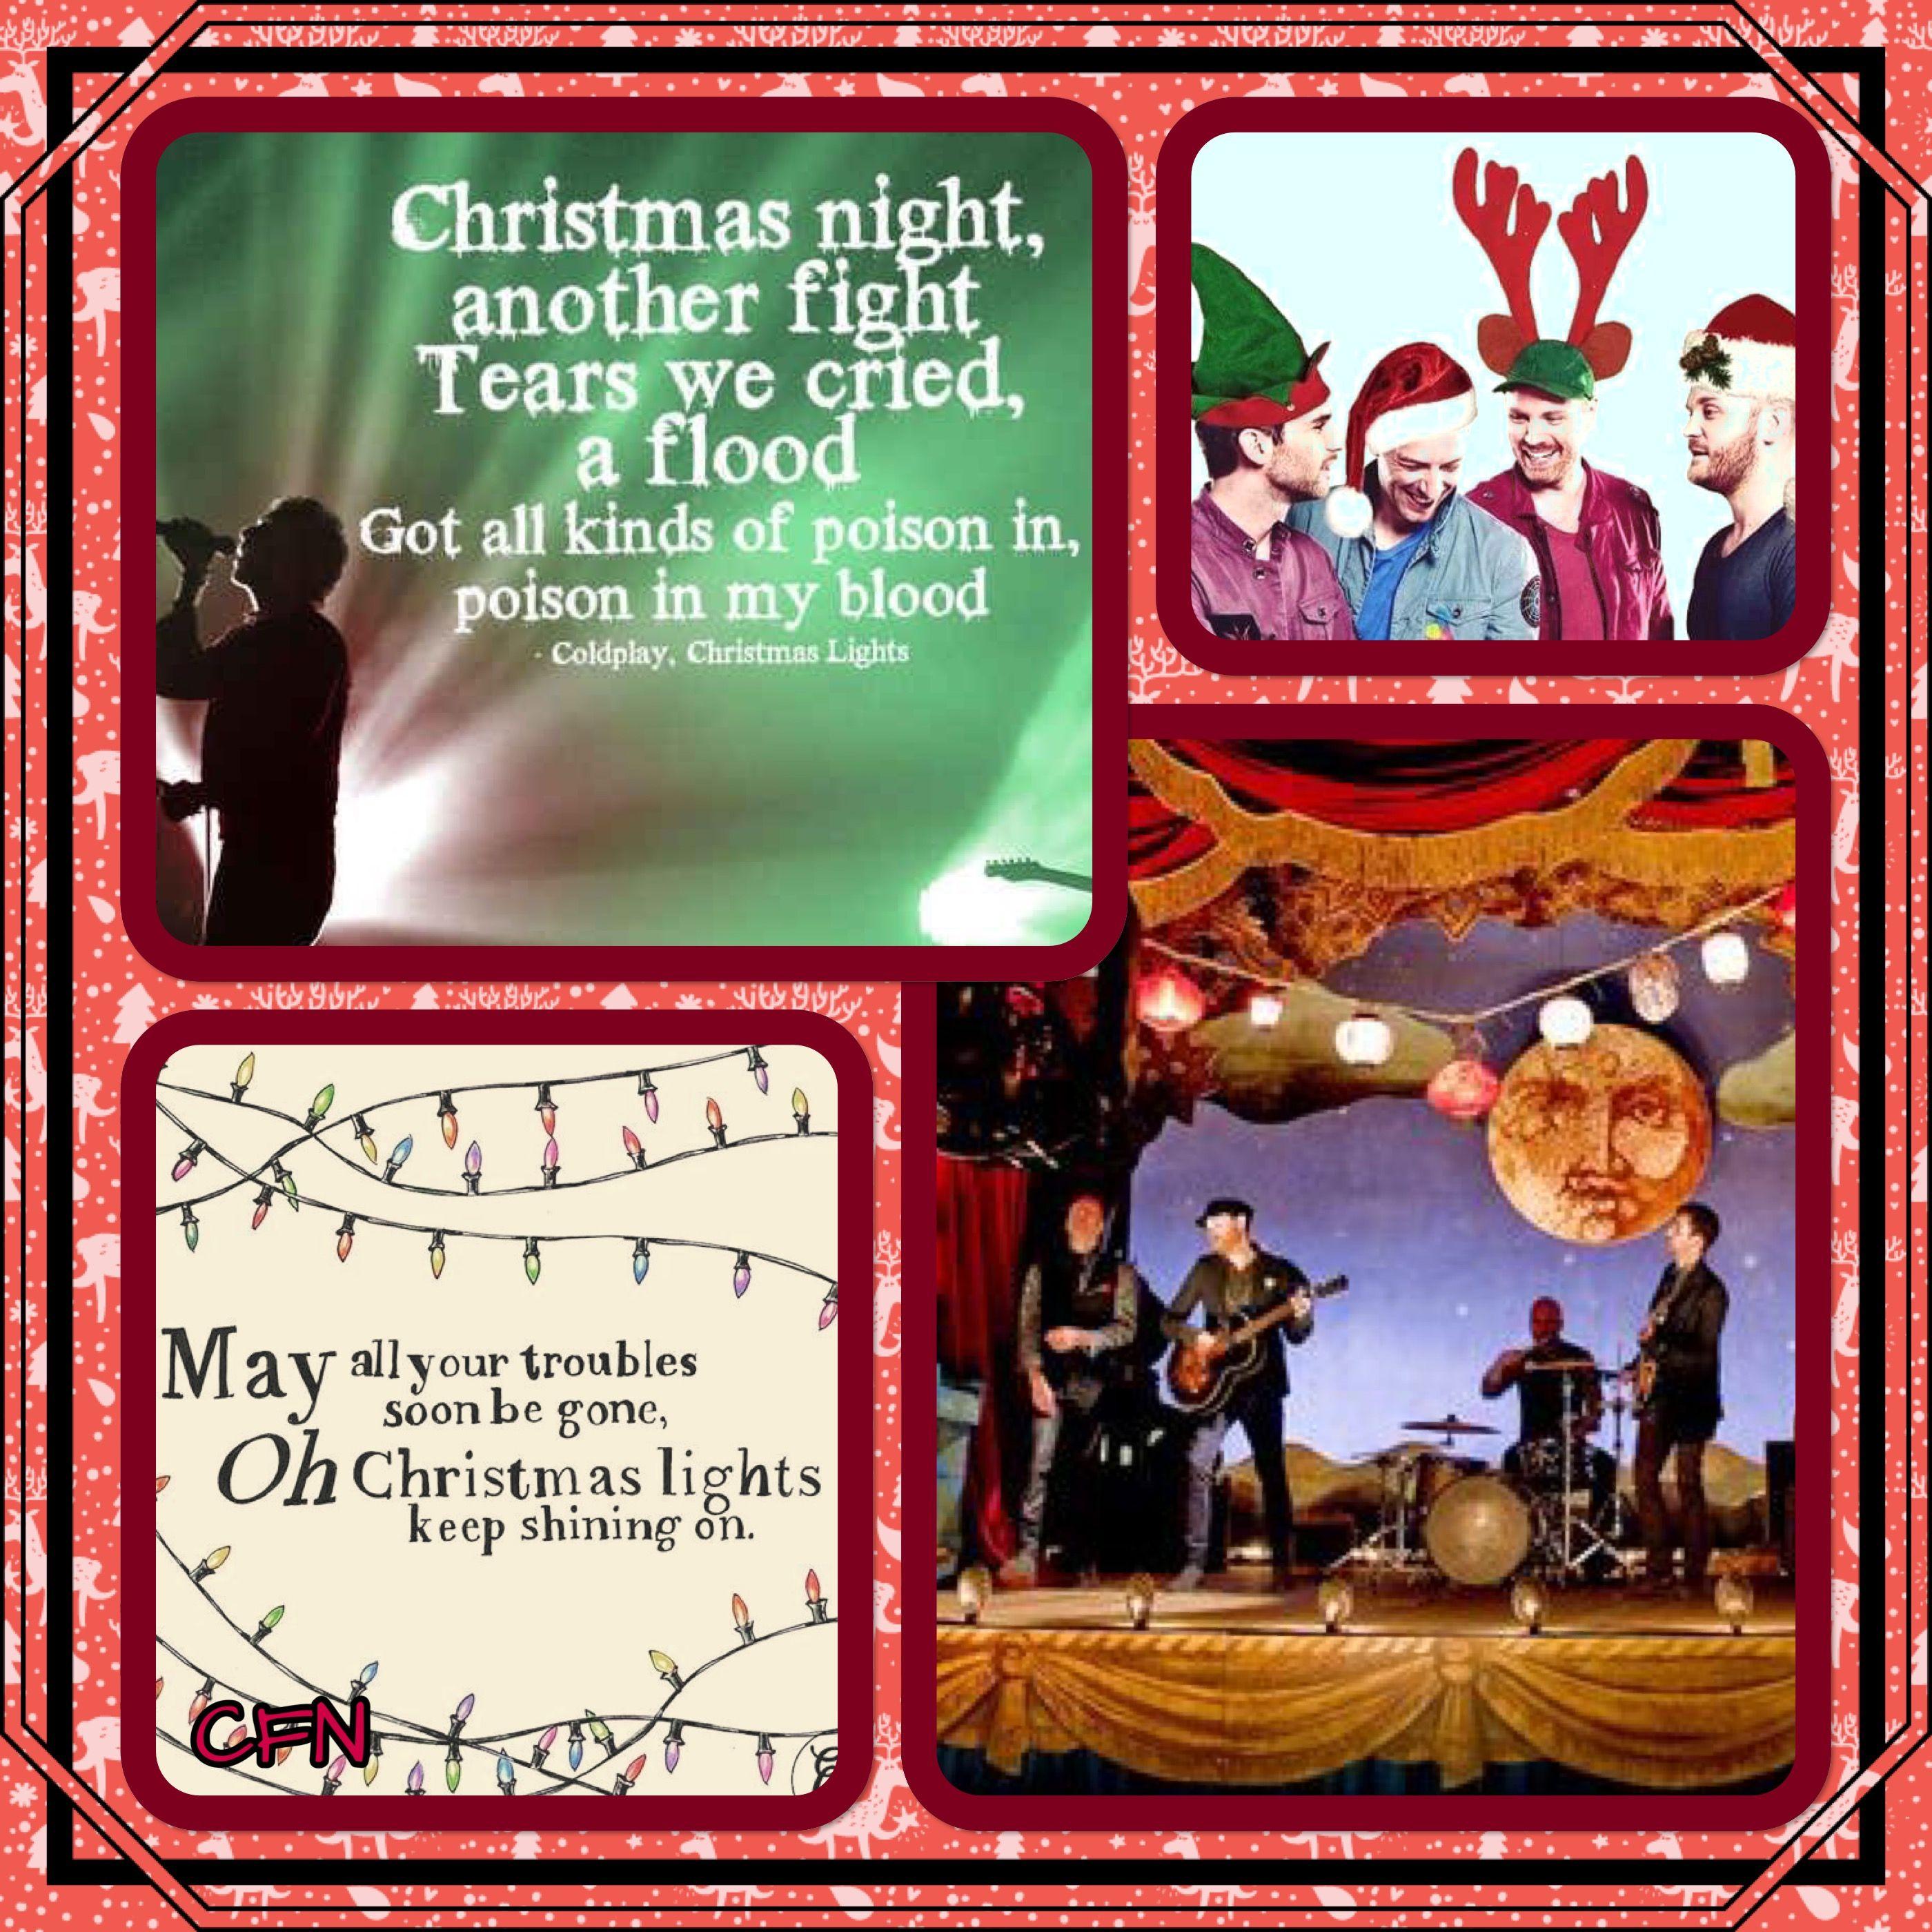 Coldplay Christmas Collage 1 Coldplay Music Lyrics